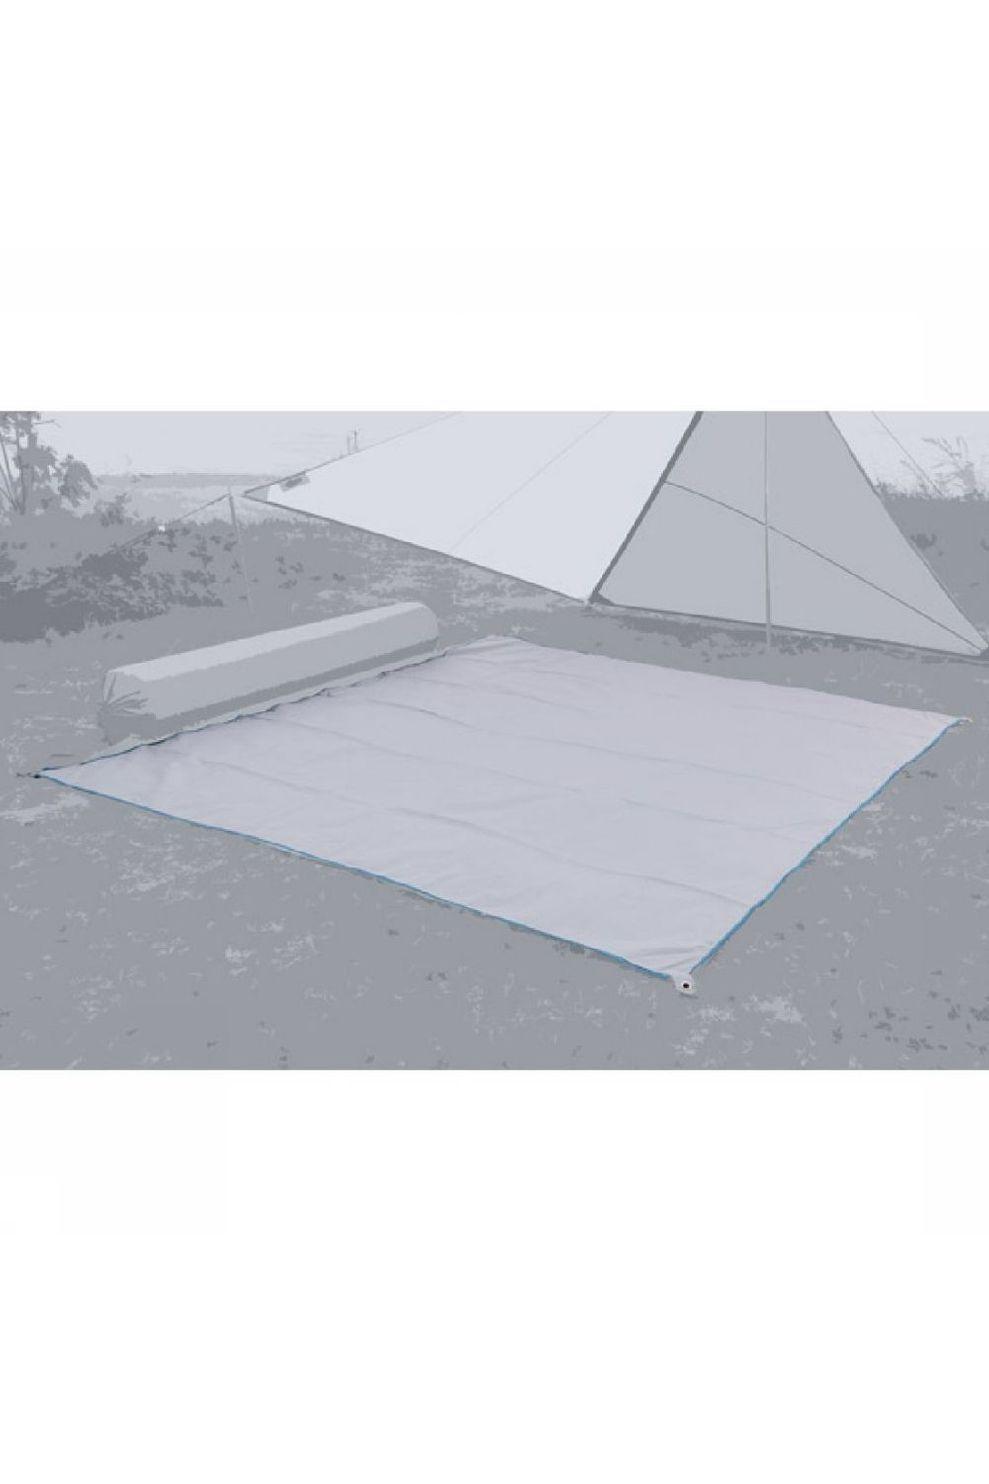 Bent Grondzeil Carpet Plain - Grijs